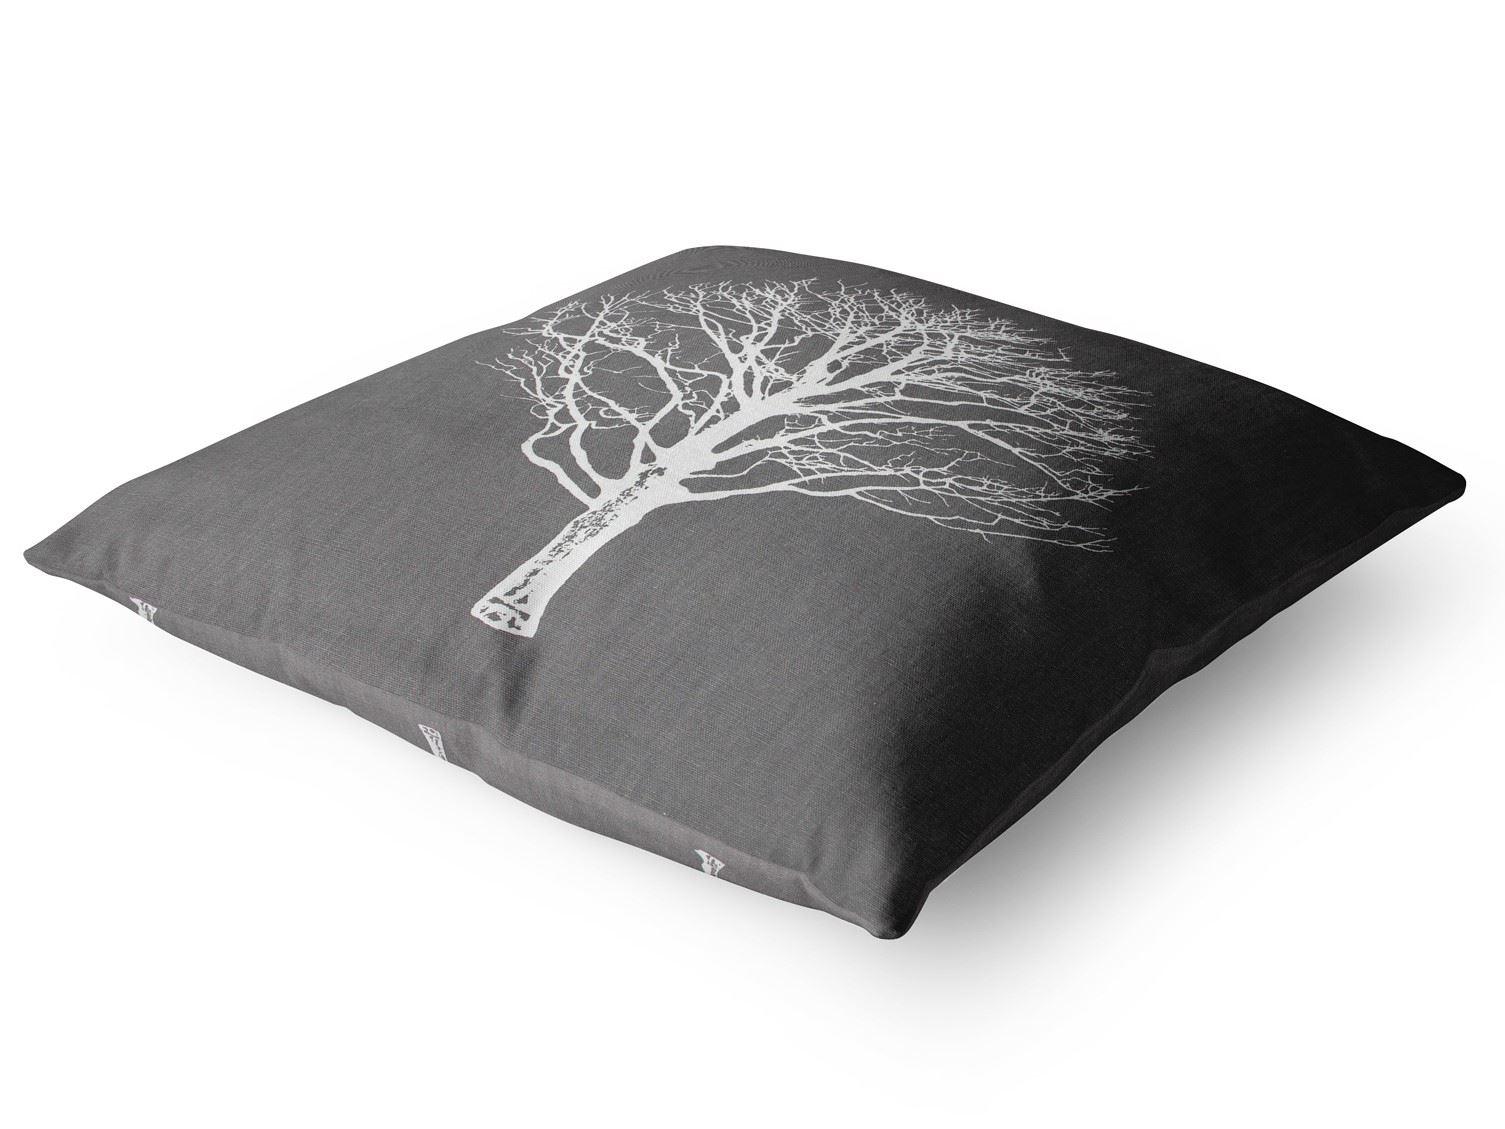 Woodland-Trees-Cushion-Cover-Modern-Reversible-Tree-Print-Covers-17-034-x-17-034 thumbnail 4